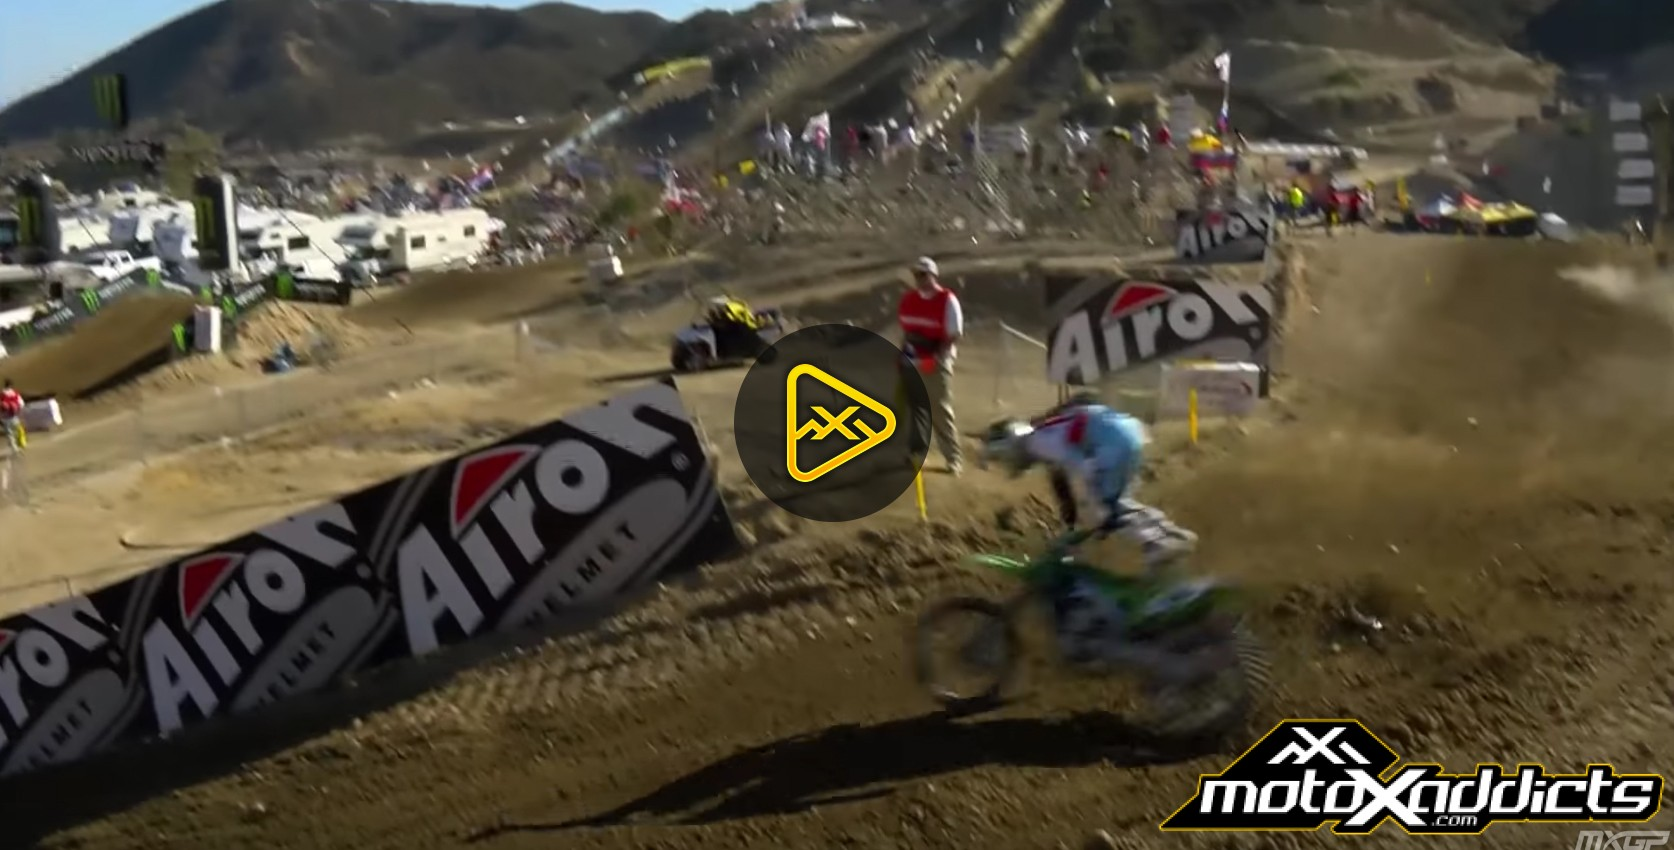 Tommy Searle Crash – 2016 MXGP of USA